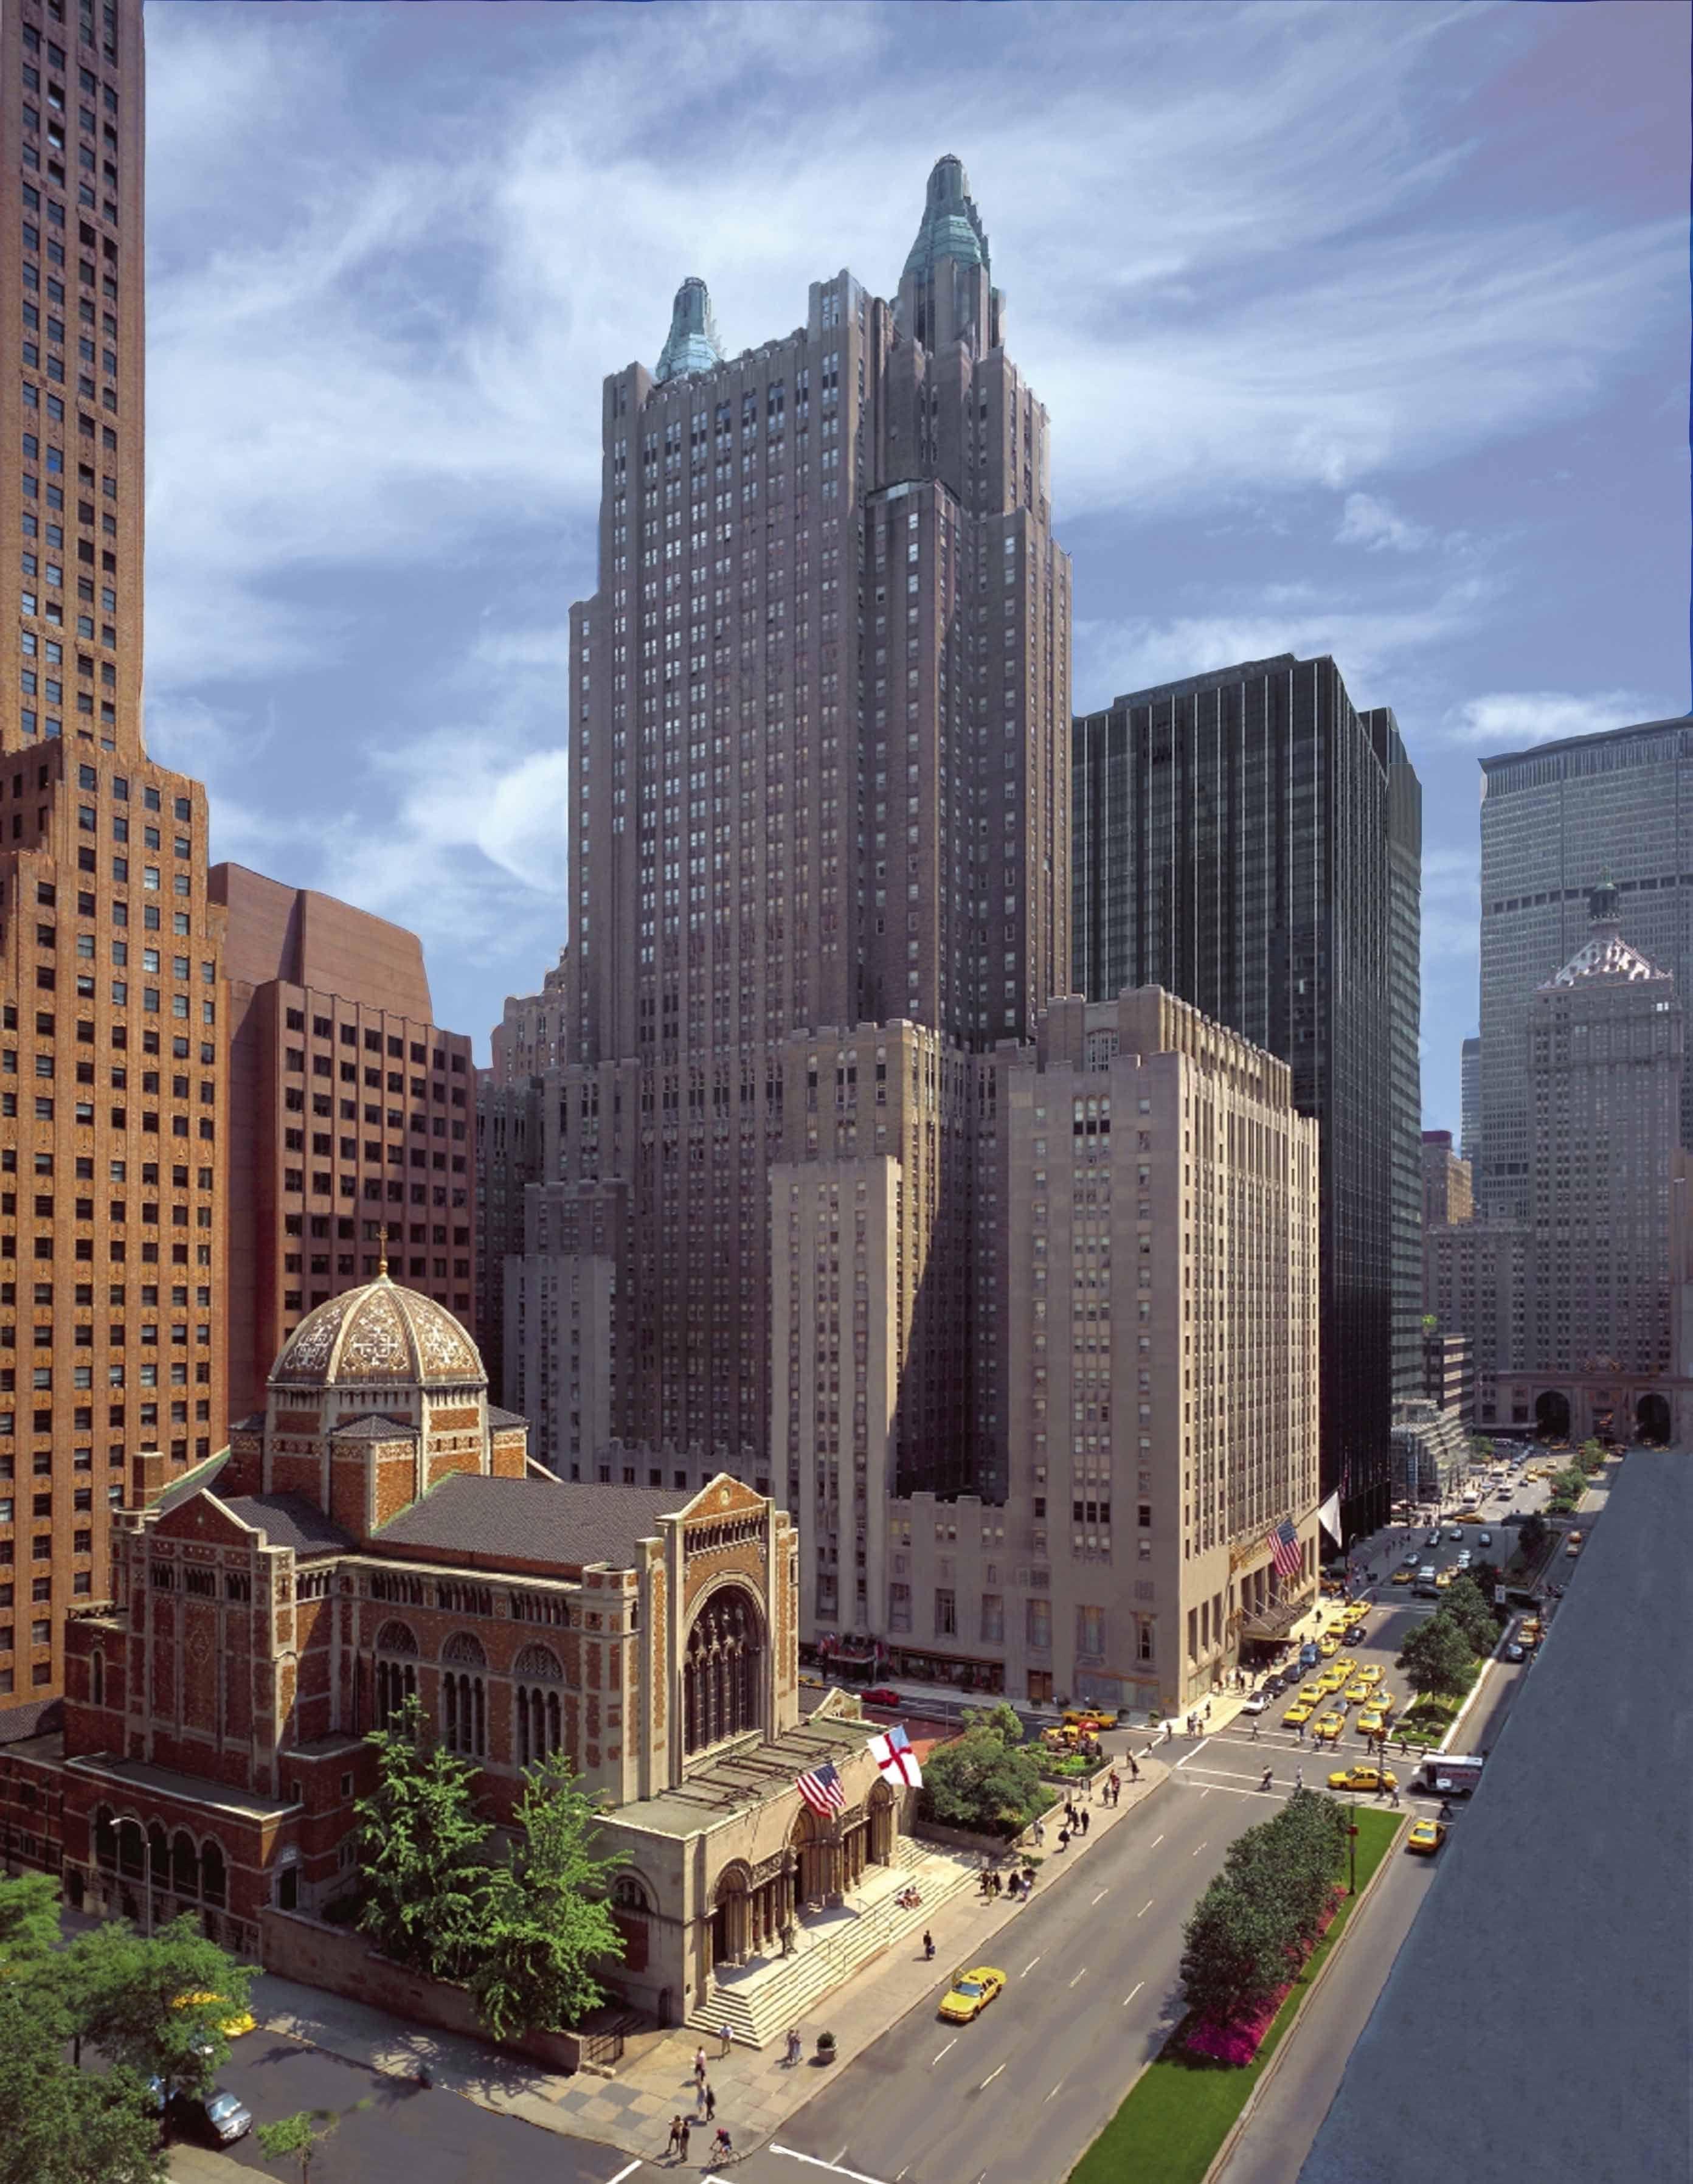 Waldorf Astoria Orlando In Orlando Fl 498 Rooms Description From Themeetingmagazines Com I Searched For Thi Astoria New York New York Hotels New York City